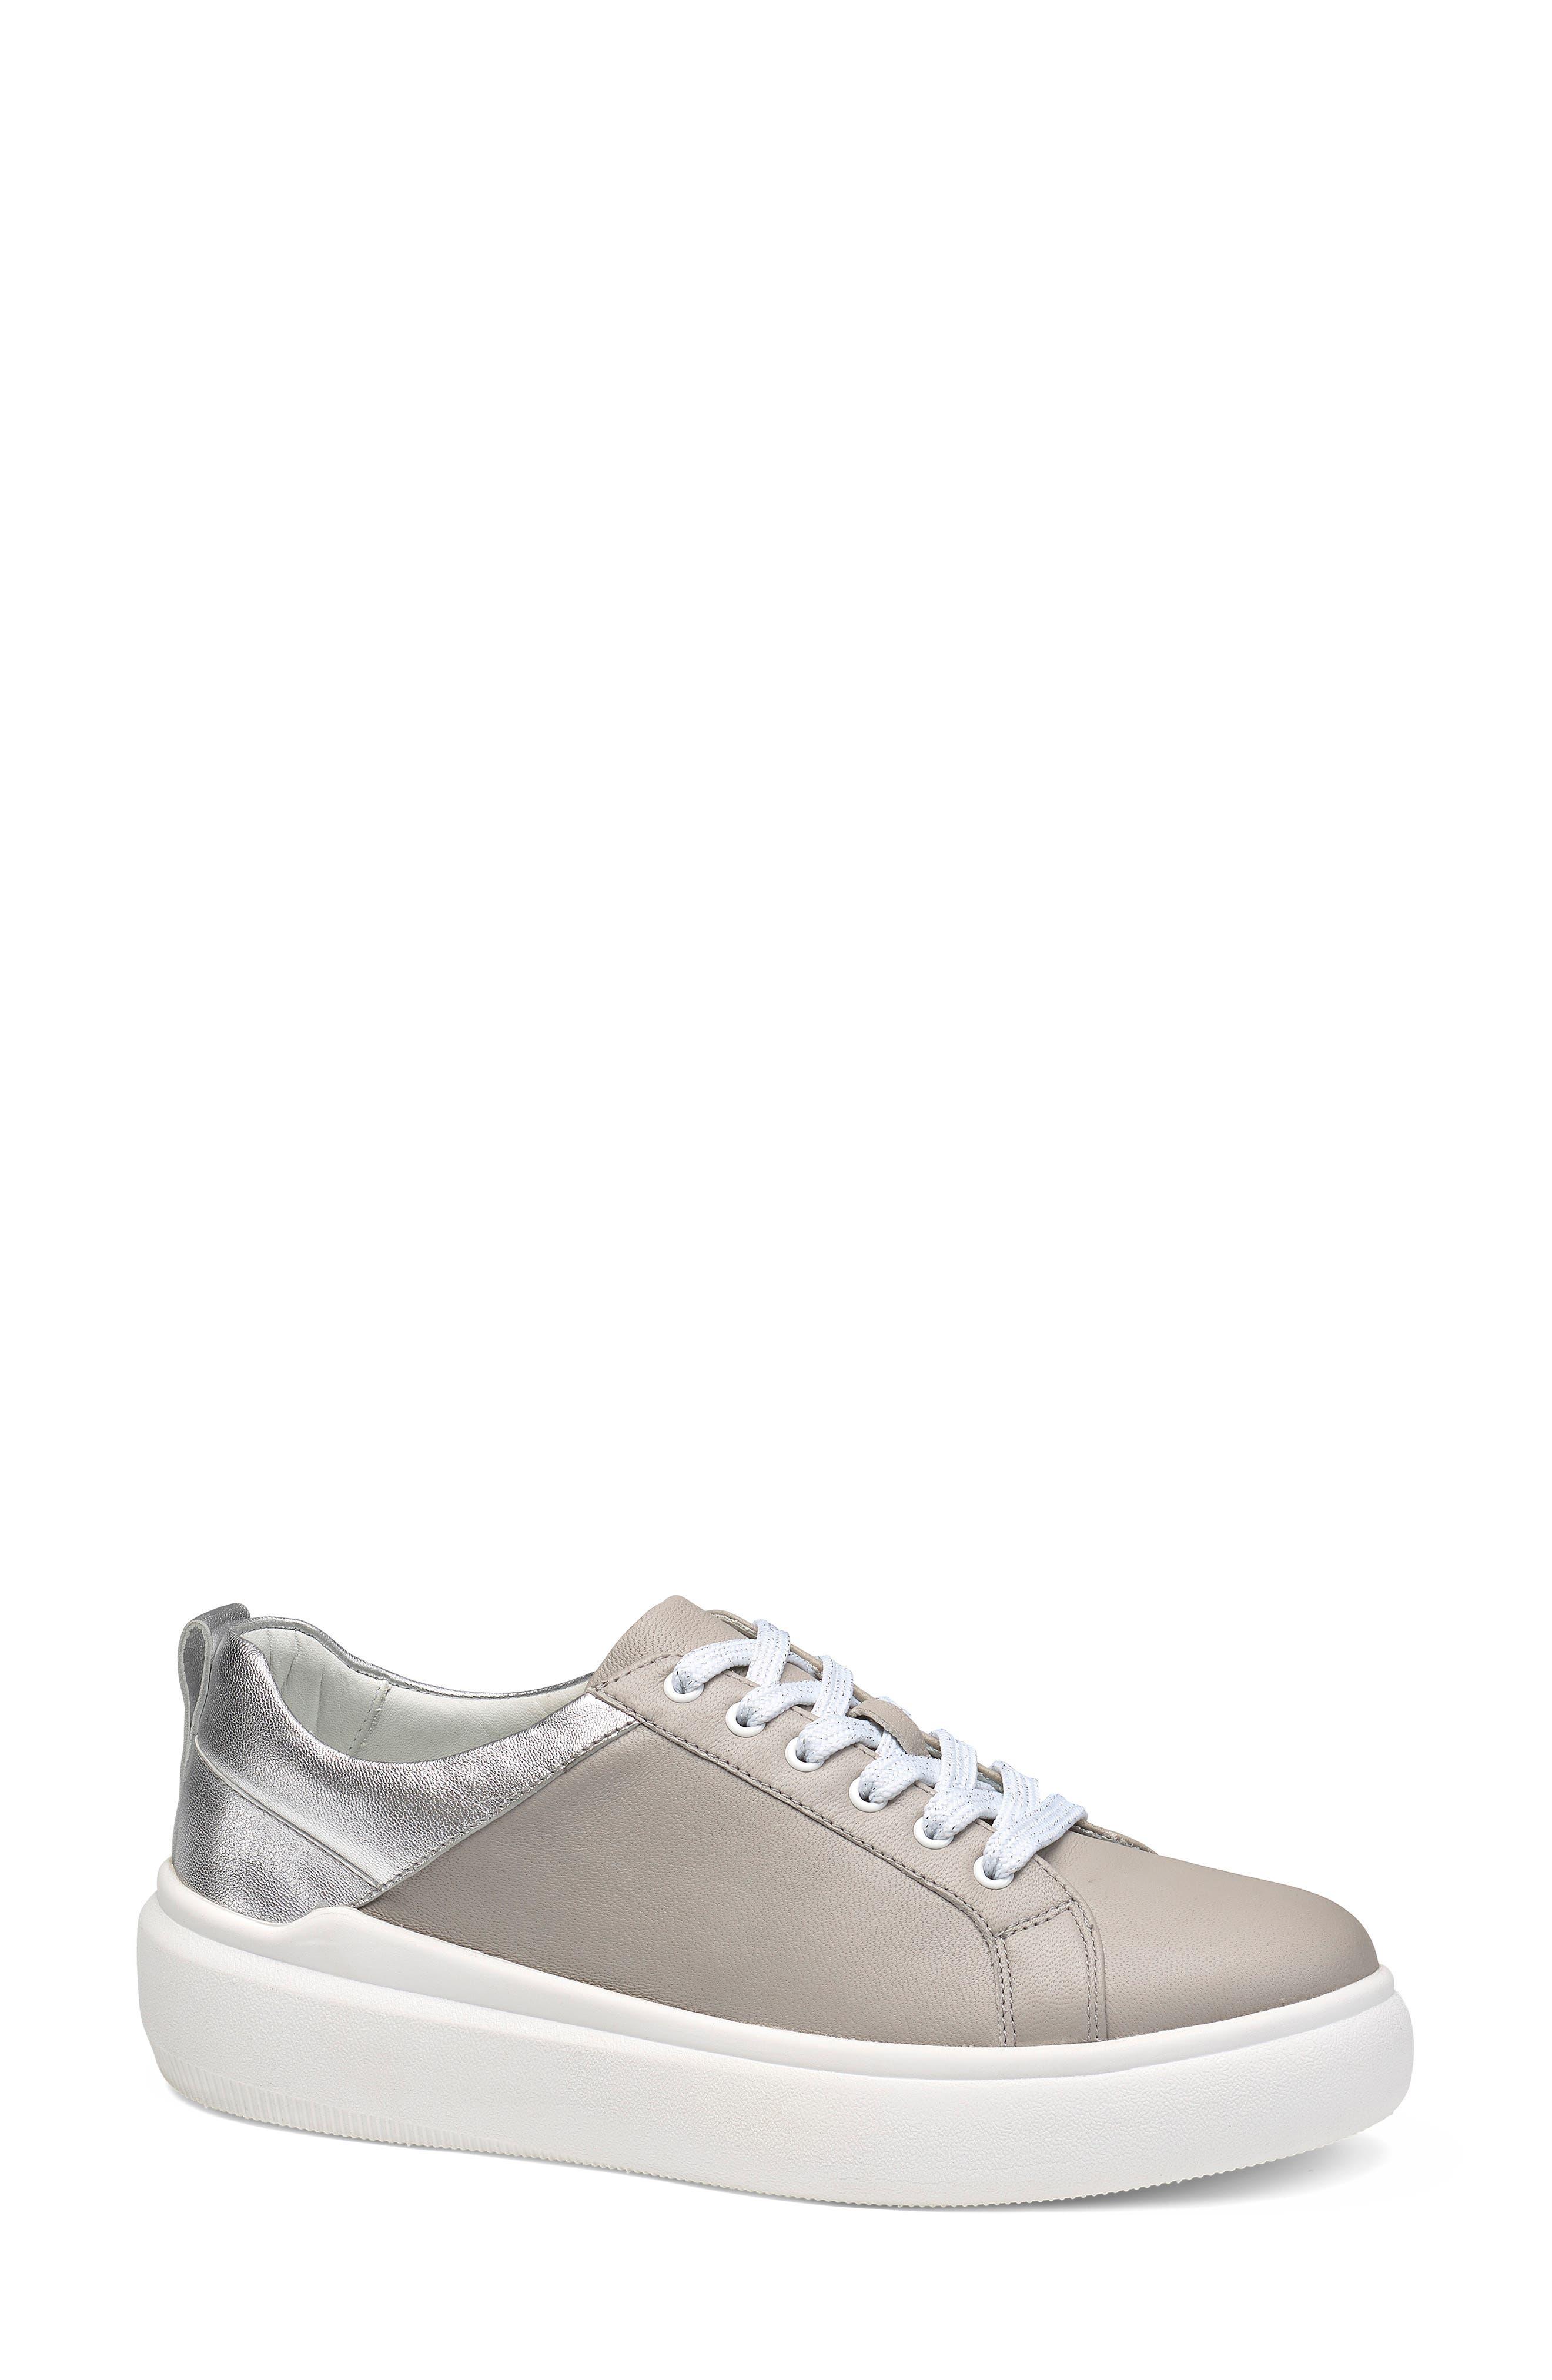 Image of Trask Layla Sneaker